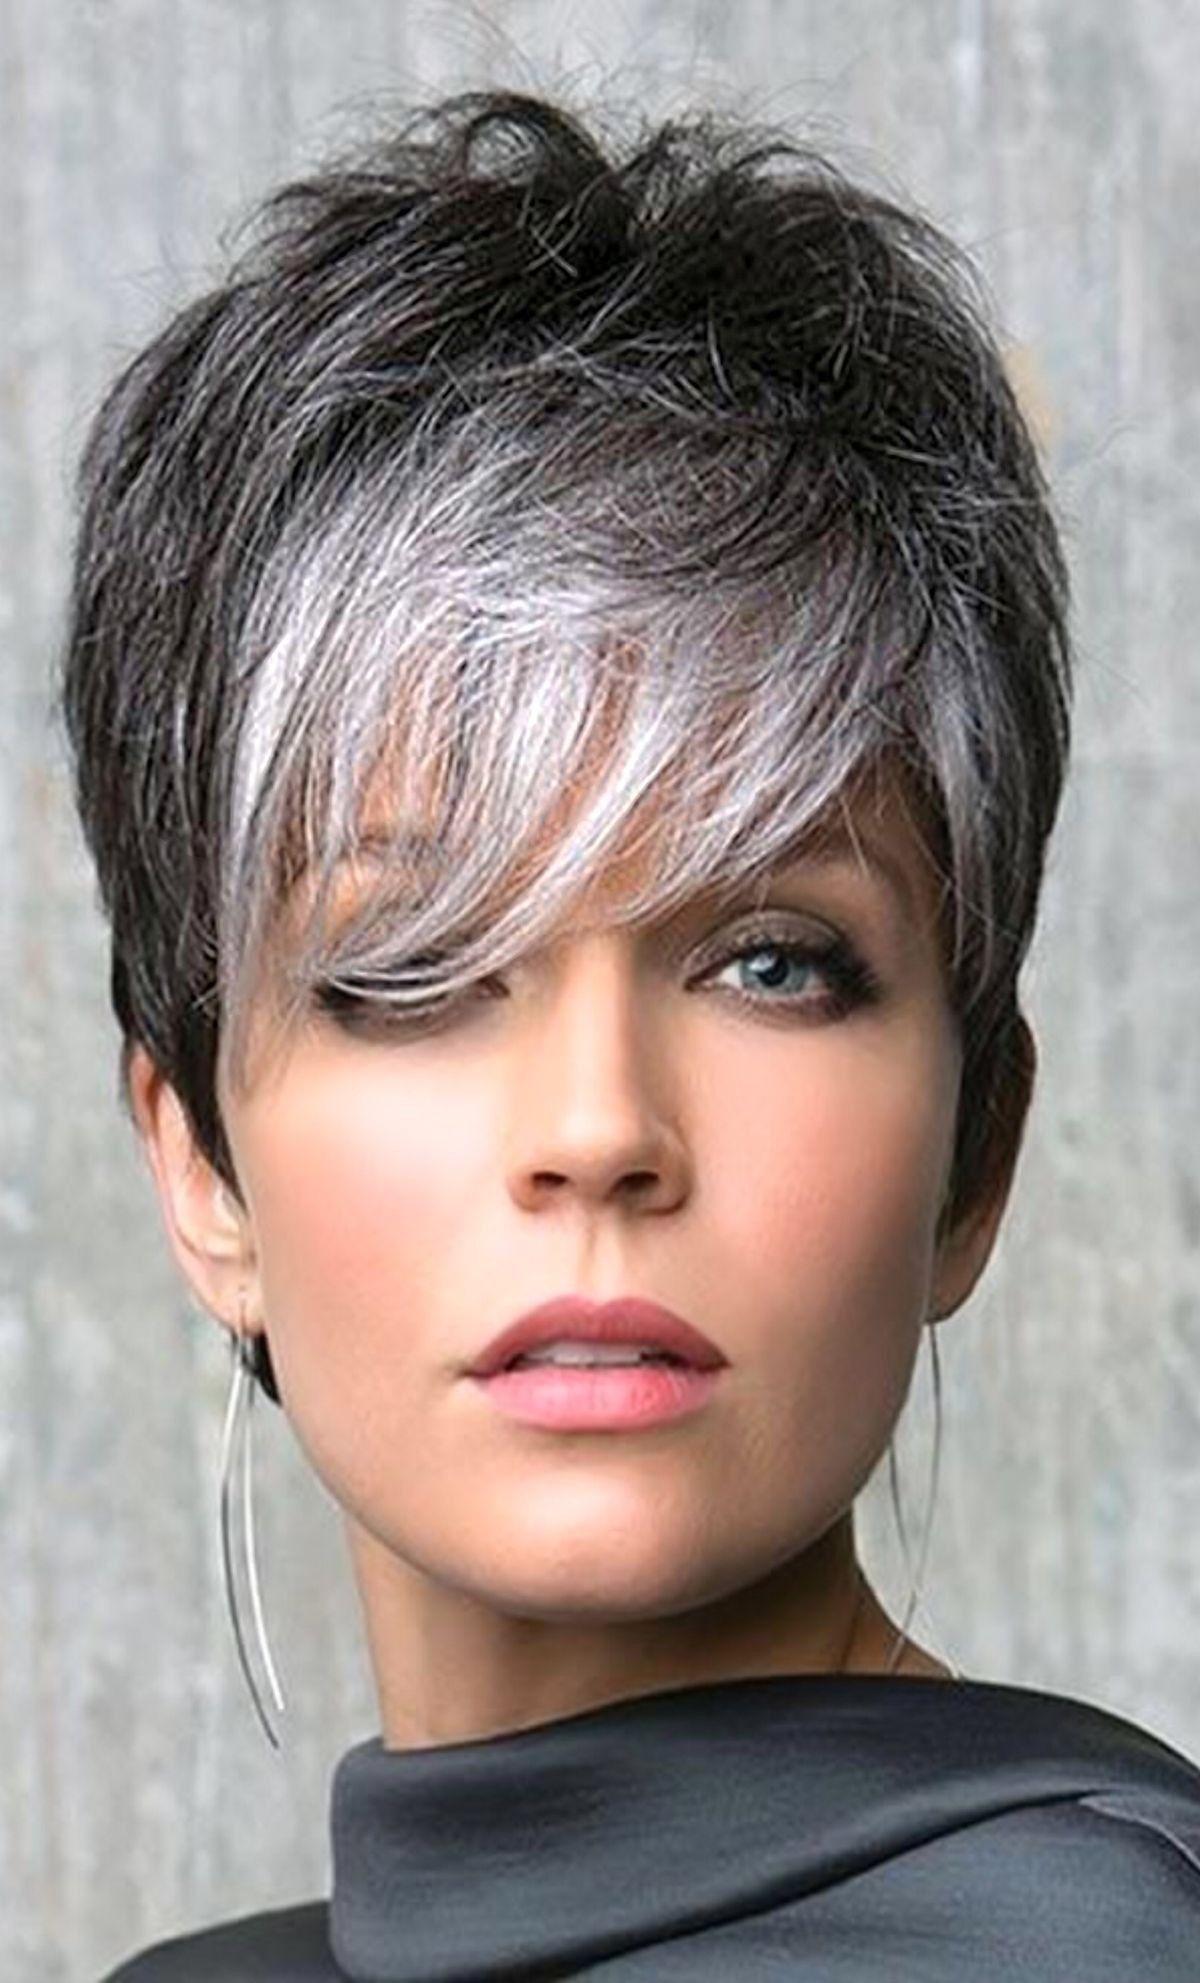 Salt and pepper hair styles fo cja pinterest hair style